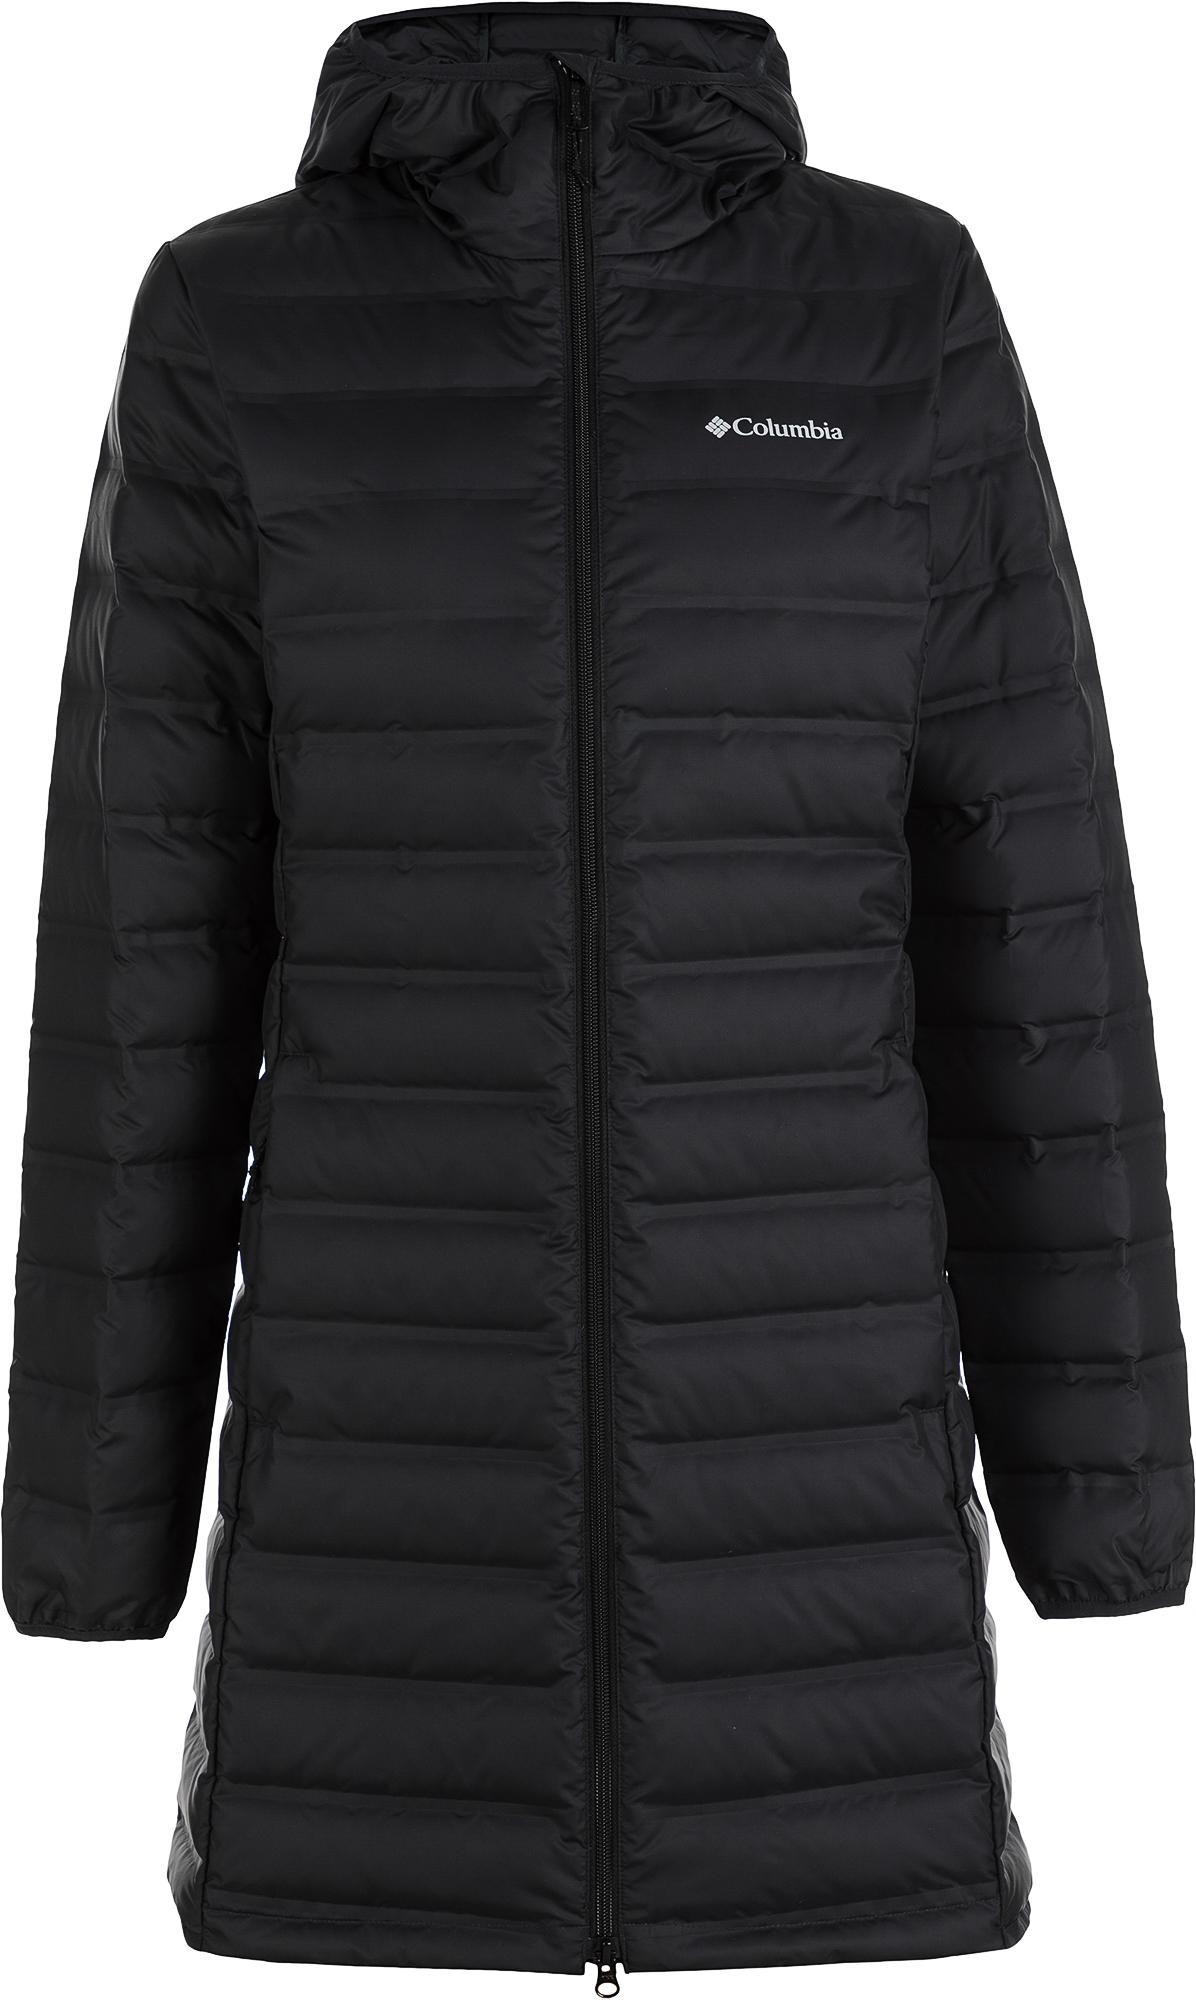 Columbia Куртка пуховая женская Columbia Lake 22, размер 46 цена